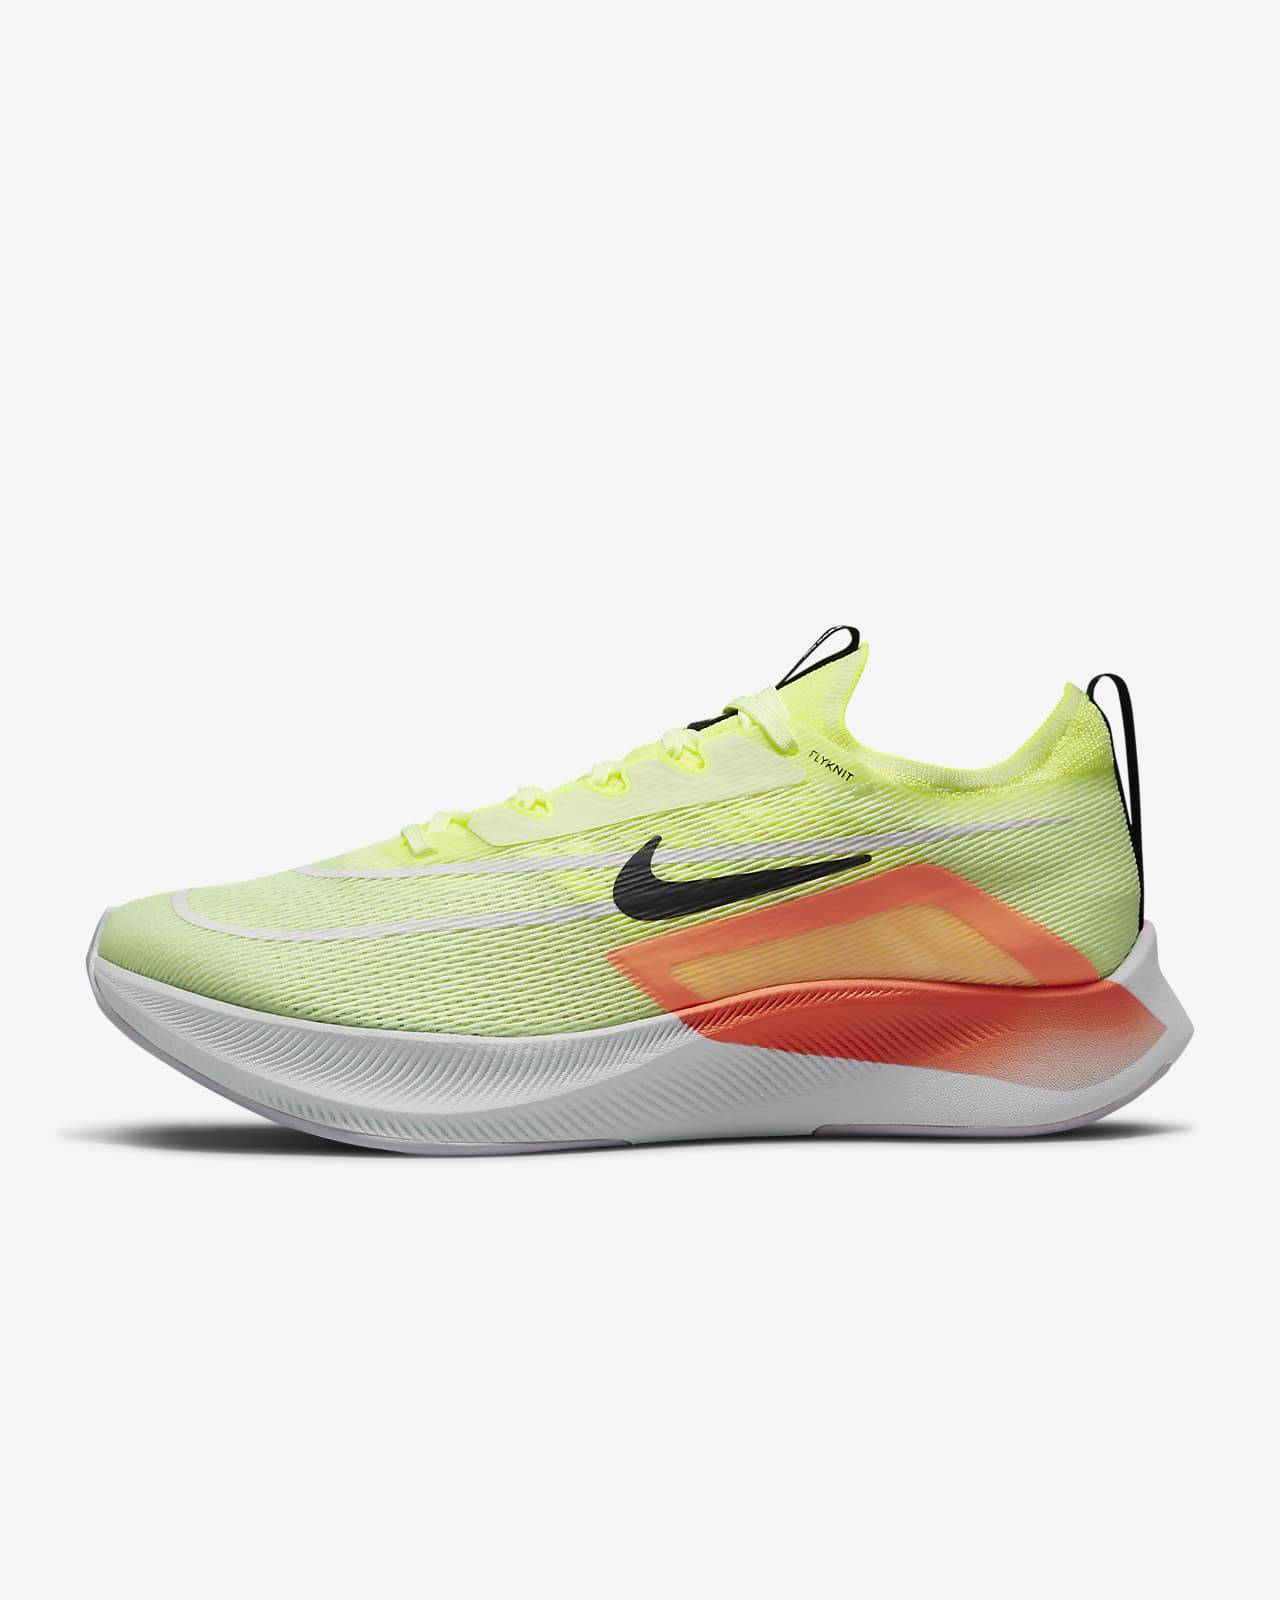 Nike Zoom Fly 4 Herren-Straßenlaufschuh